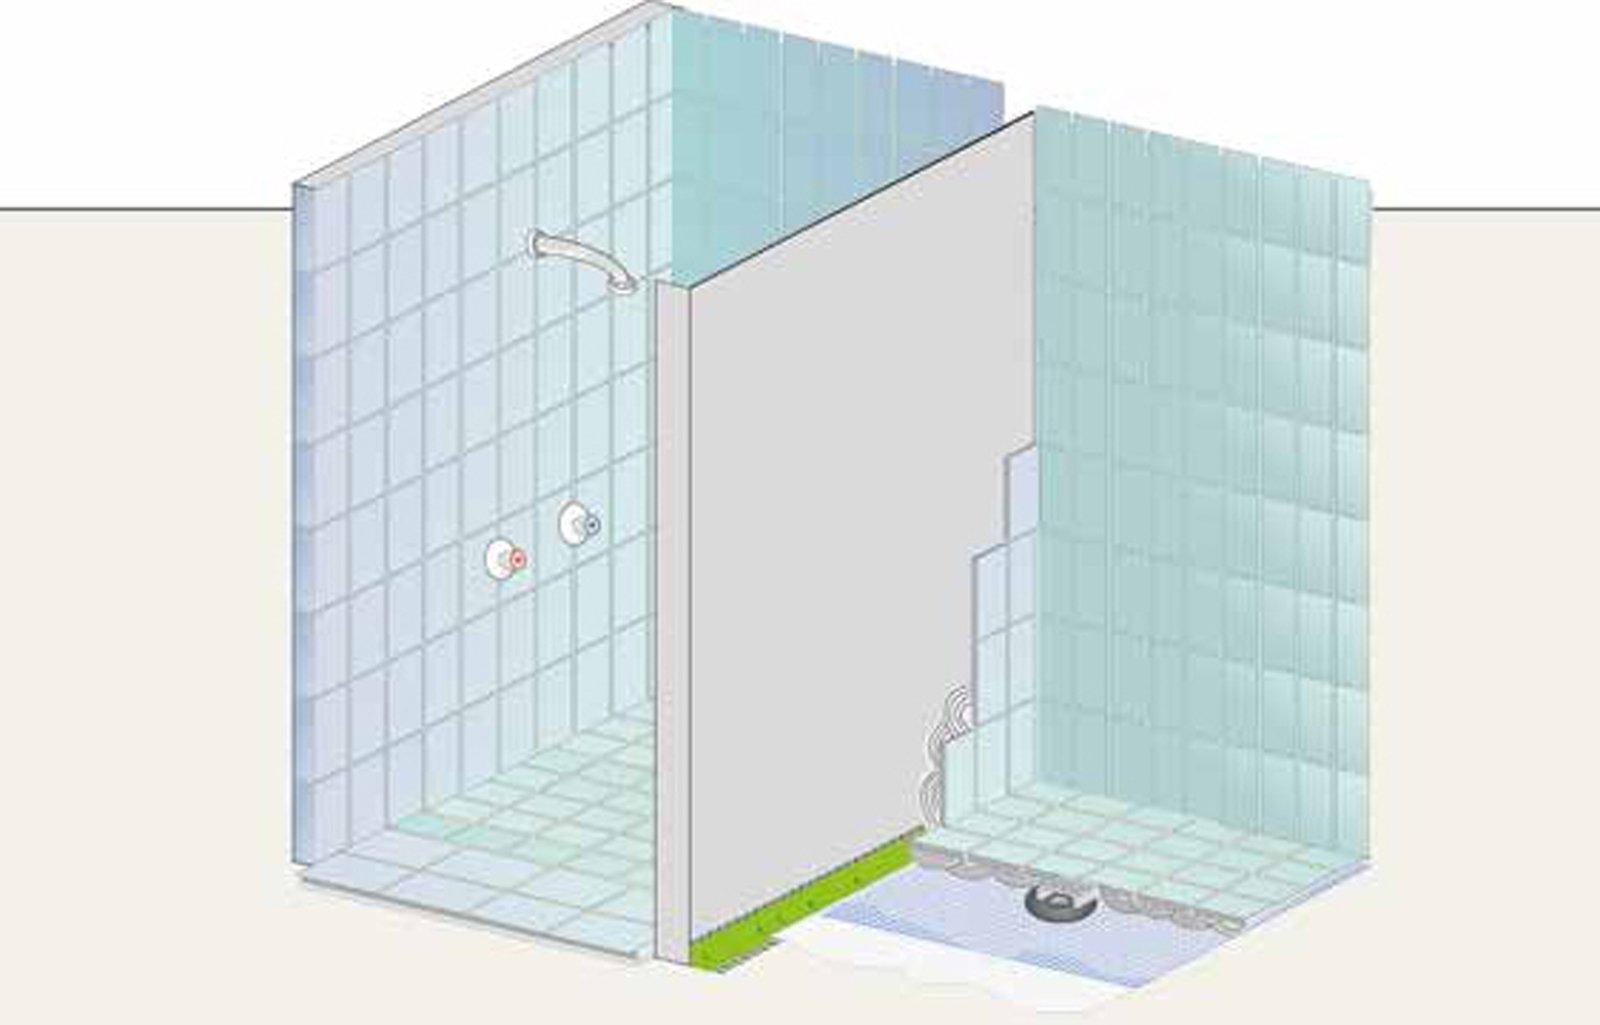 Terminali antivento per stufe a pellet page 719 - Stuccare fughe piastrelle doccia ...